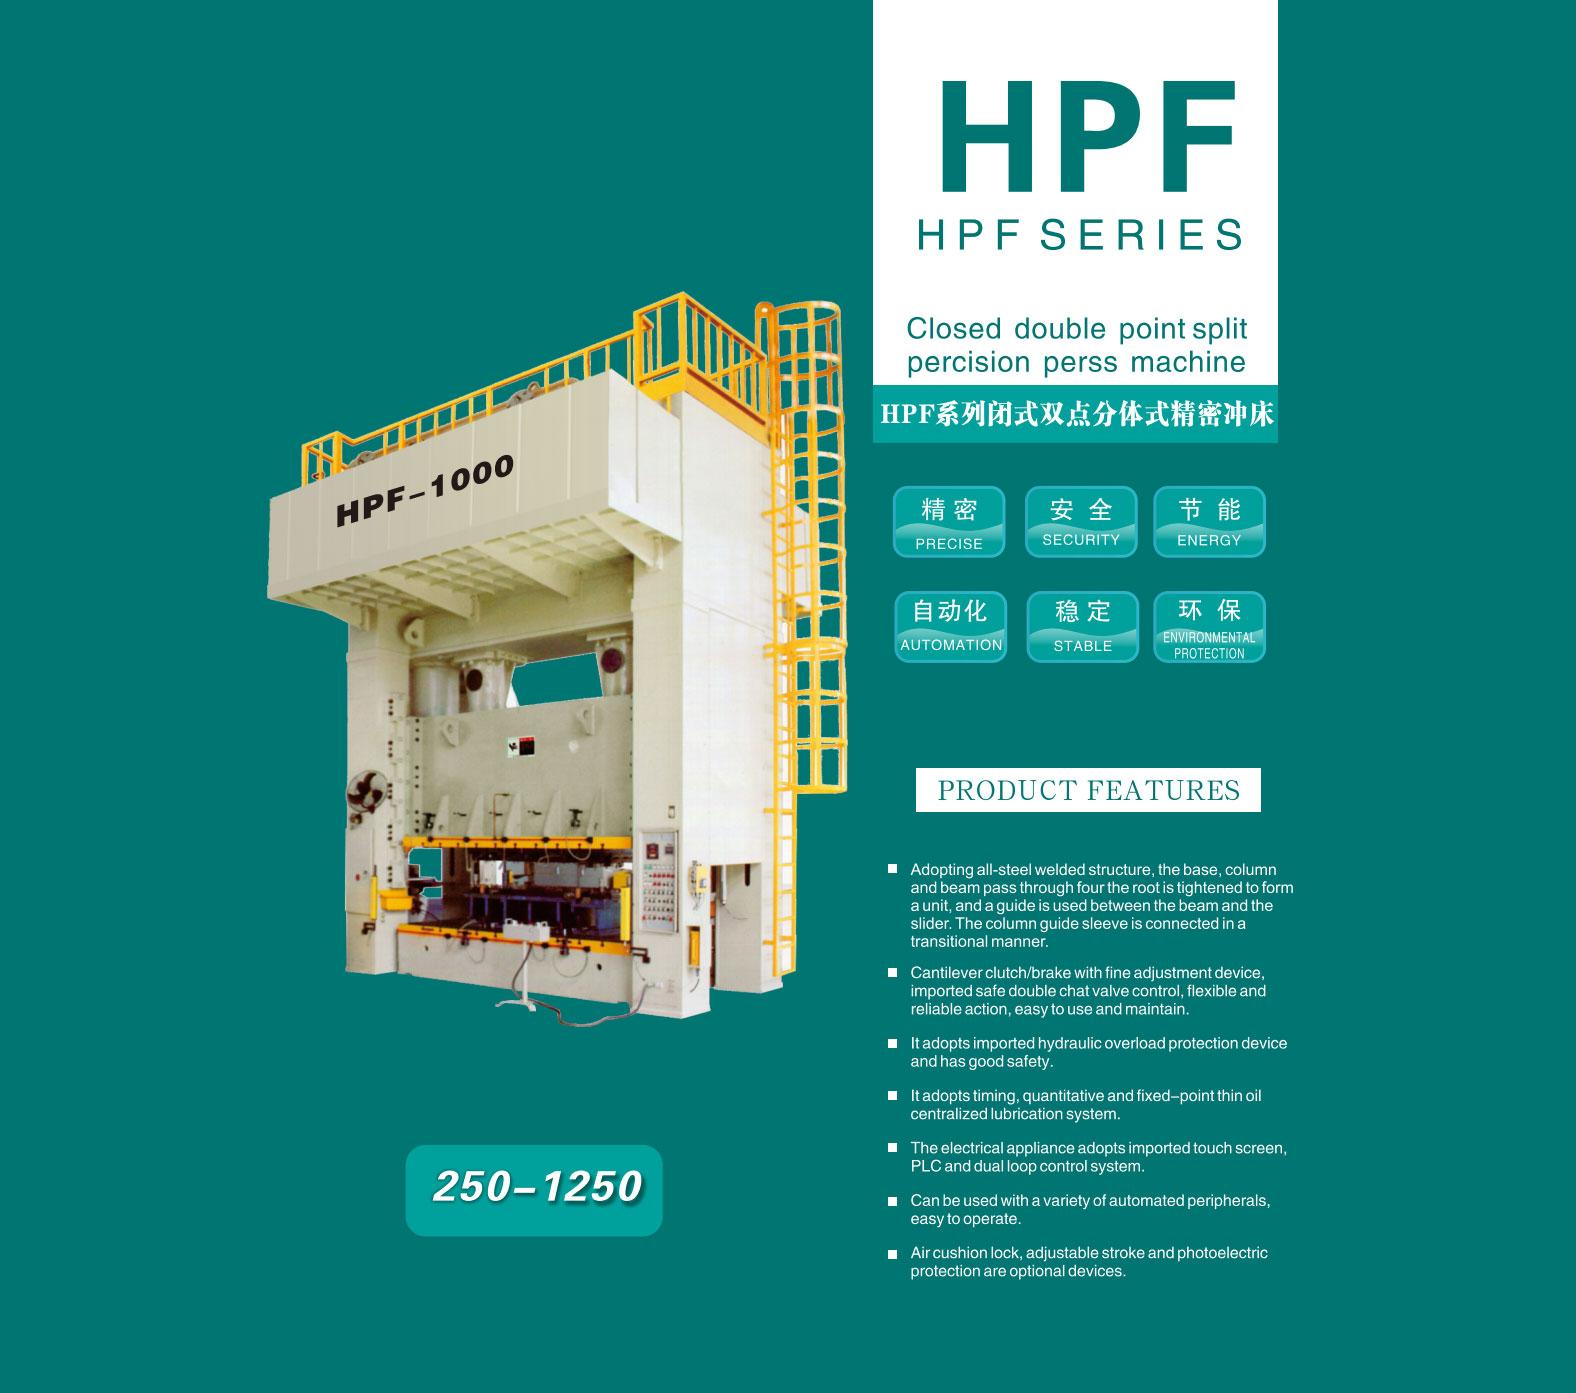 HPF-1000